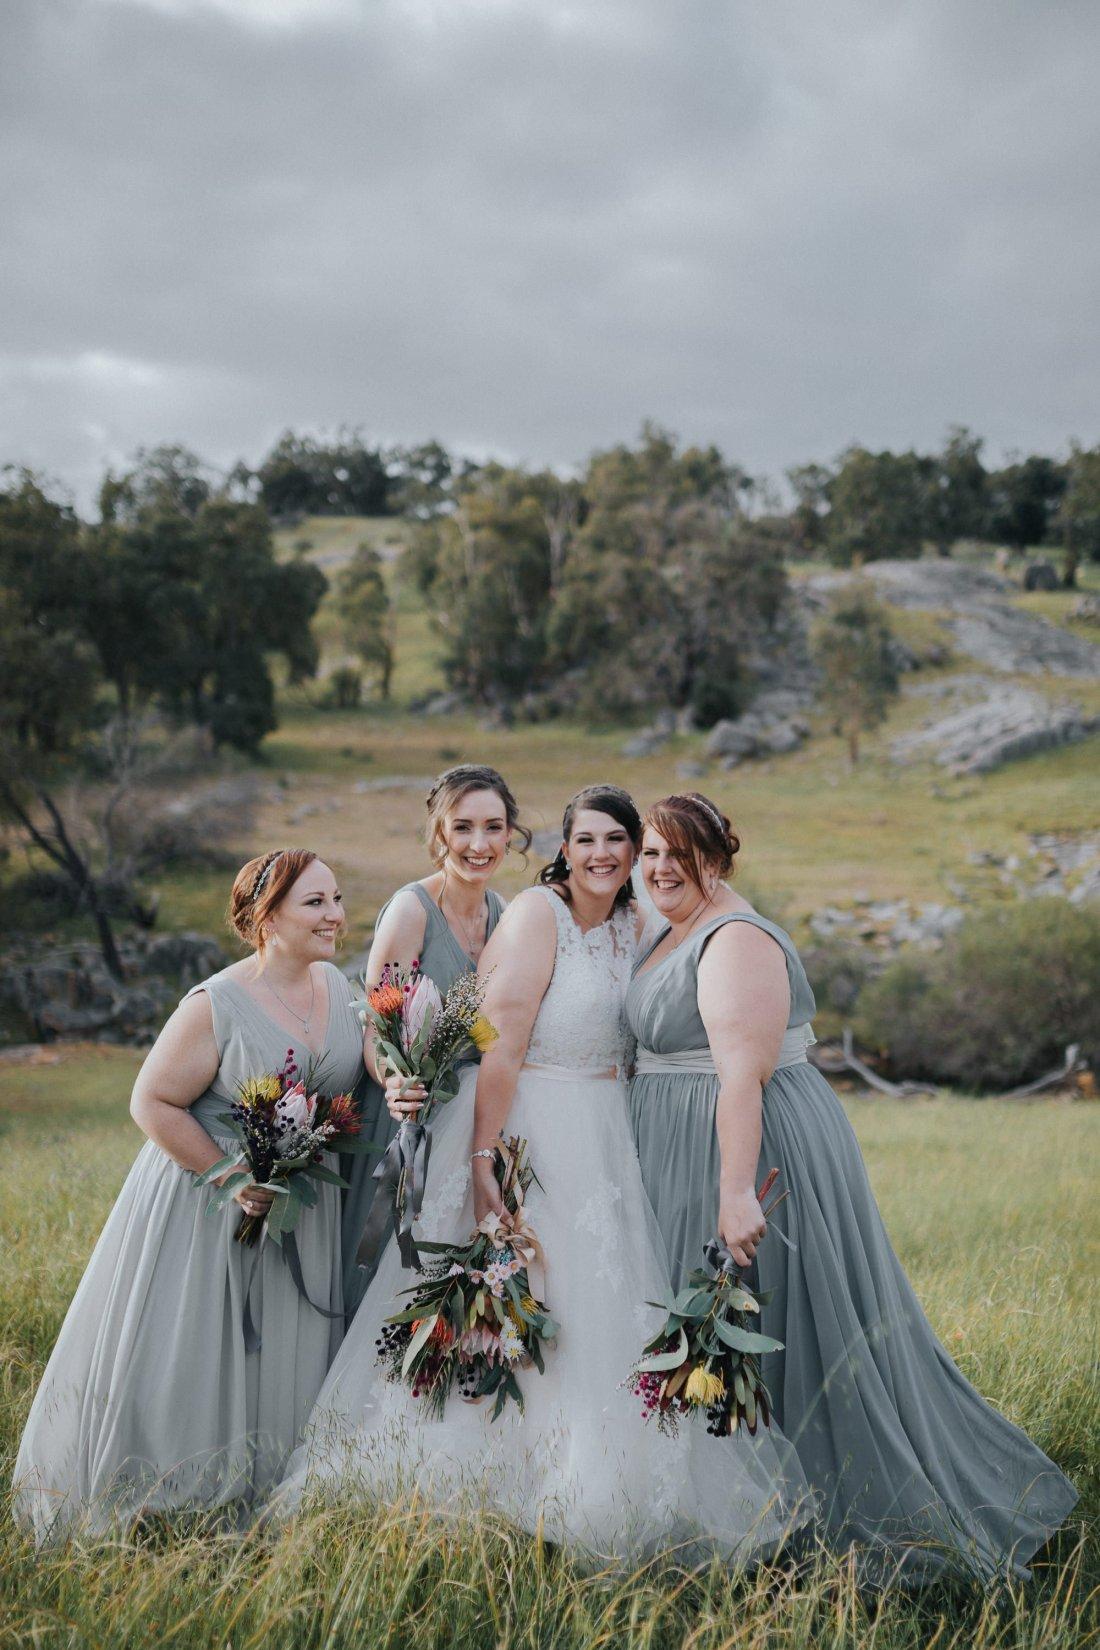 Perth Wedding Photographer   Wedding Photographers Perth   Bells Rapids Wedding   Zoe Theaidore Photography   Ebony Blush Photography   M+K198